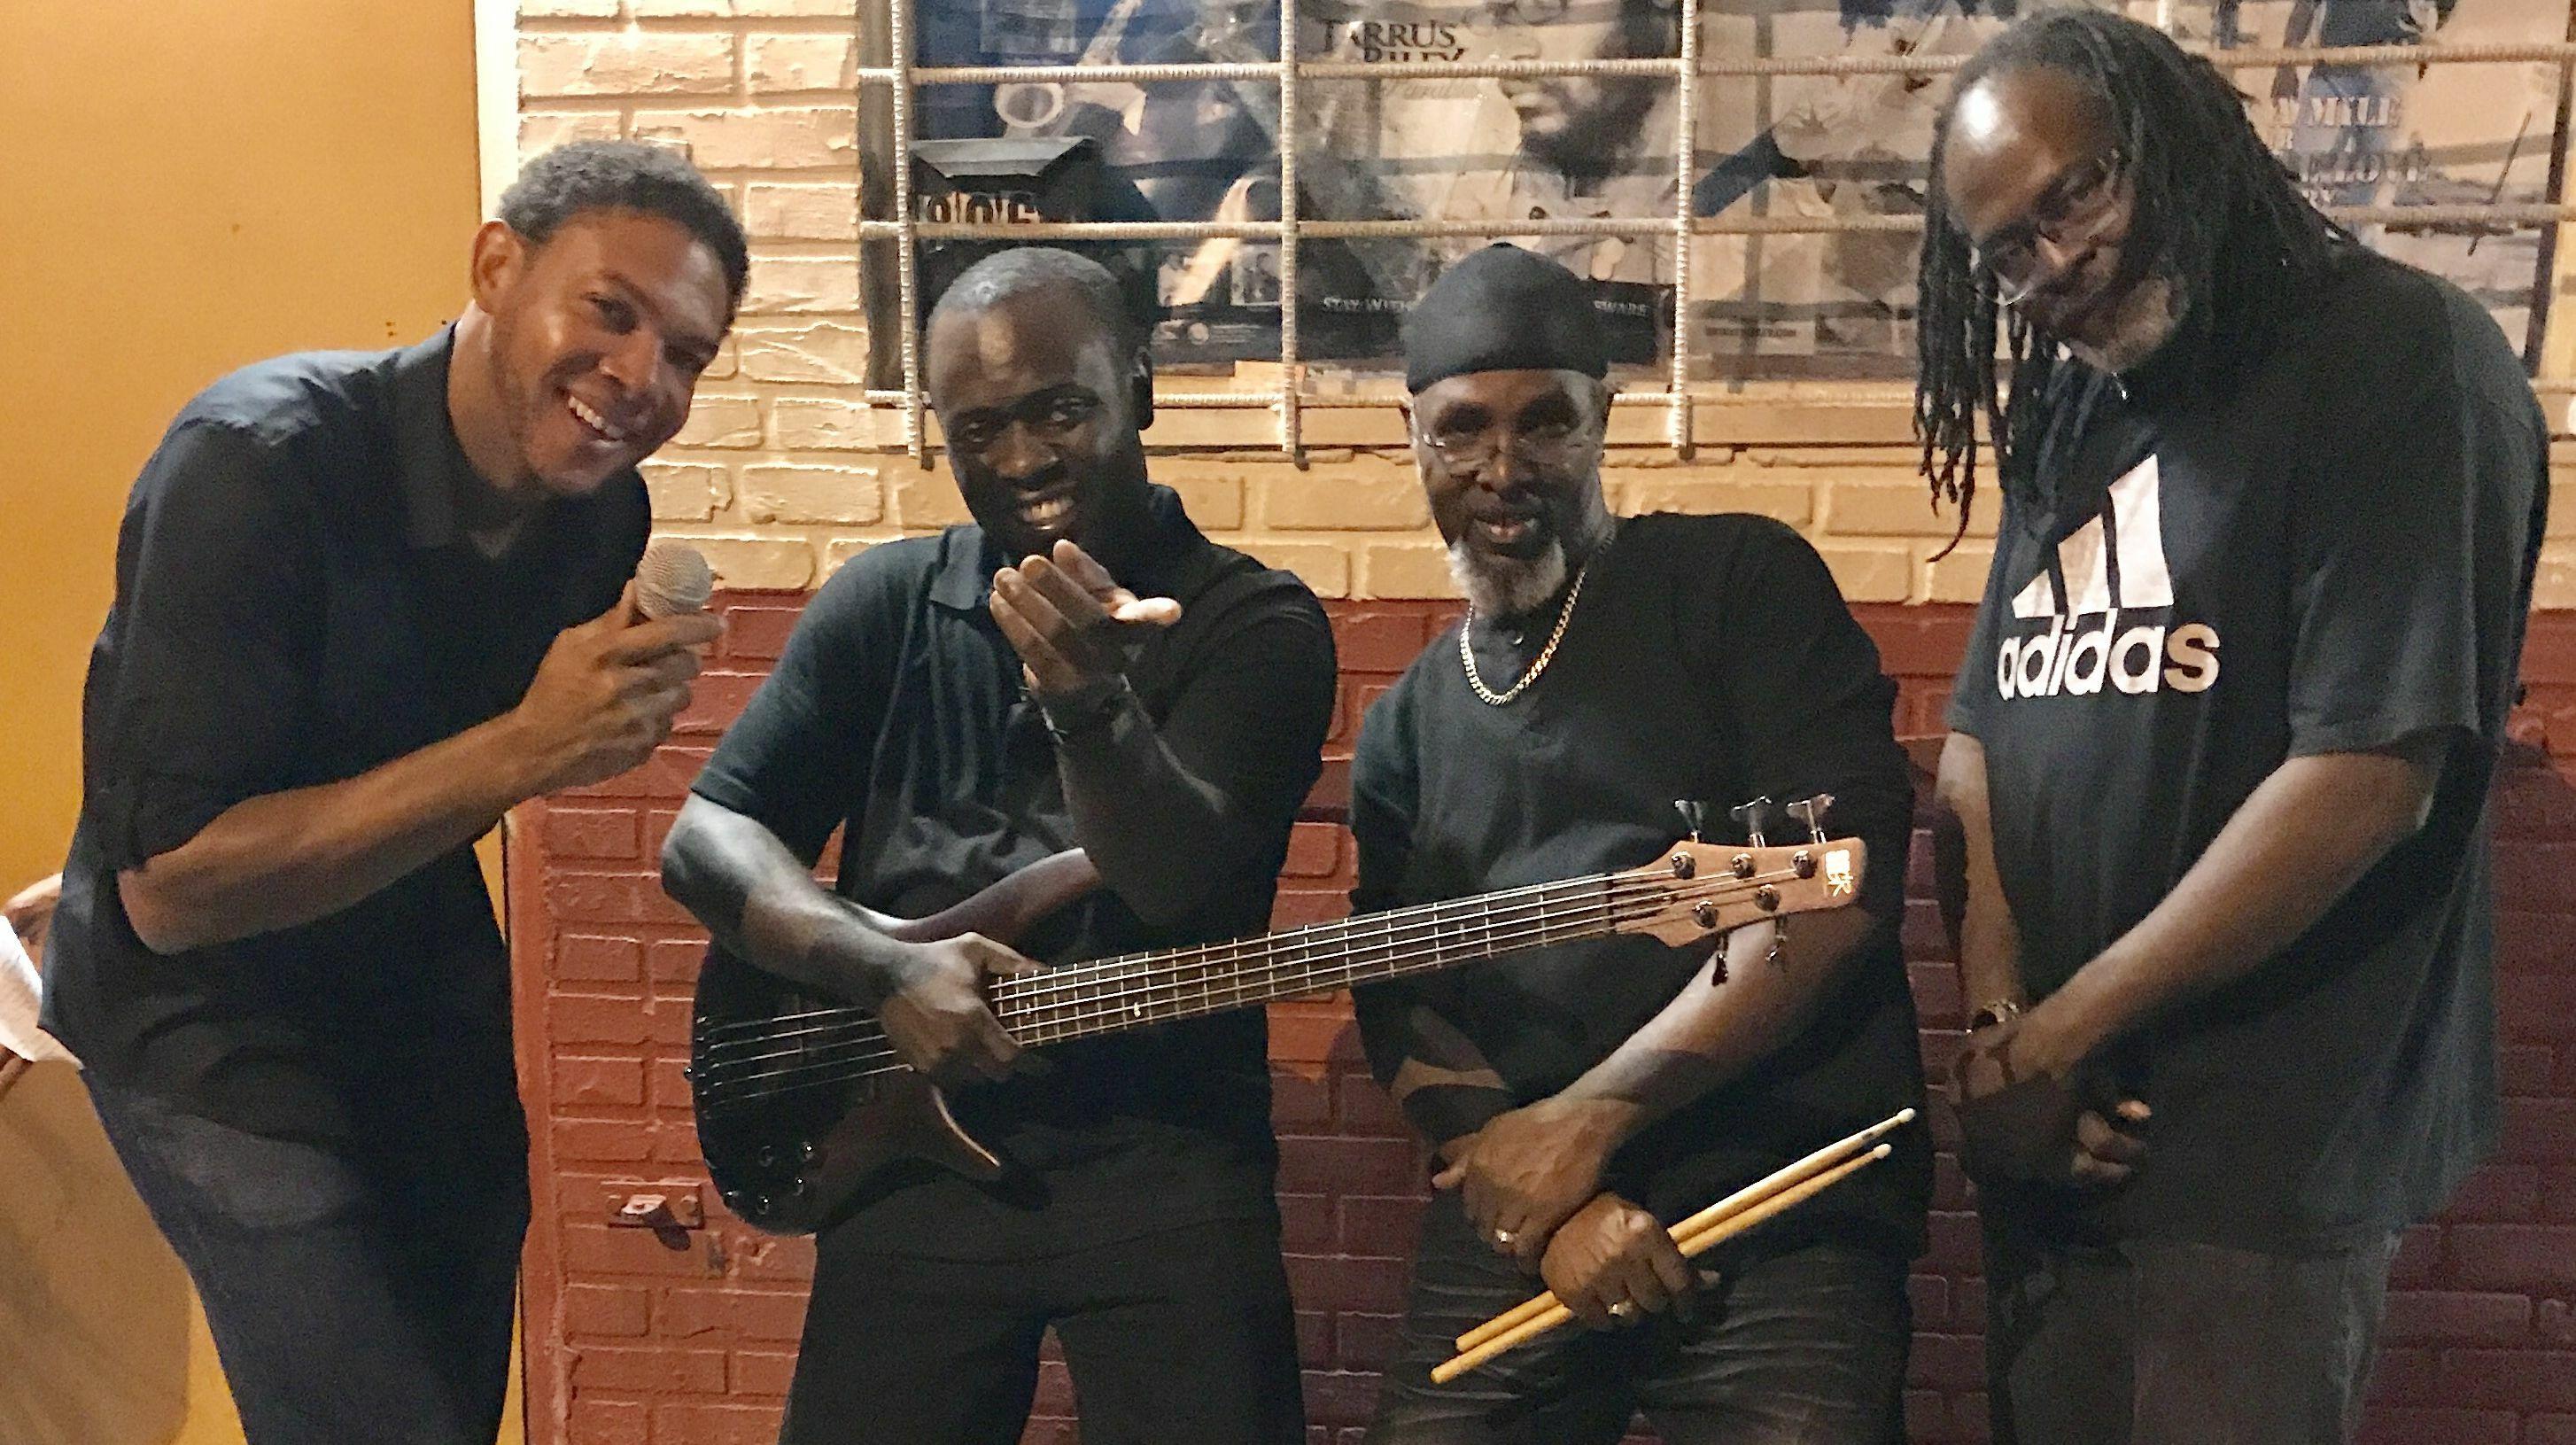 ifrolix: Reggae Band Performs Your Favorites Online